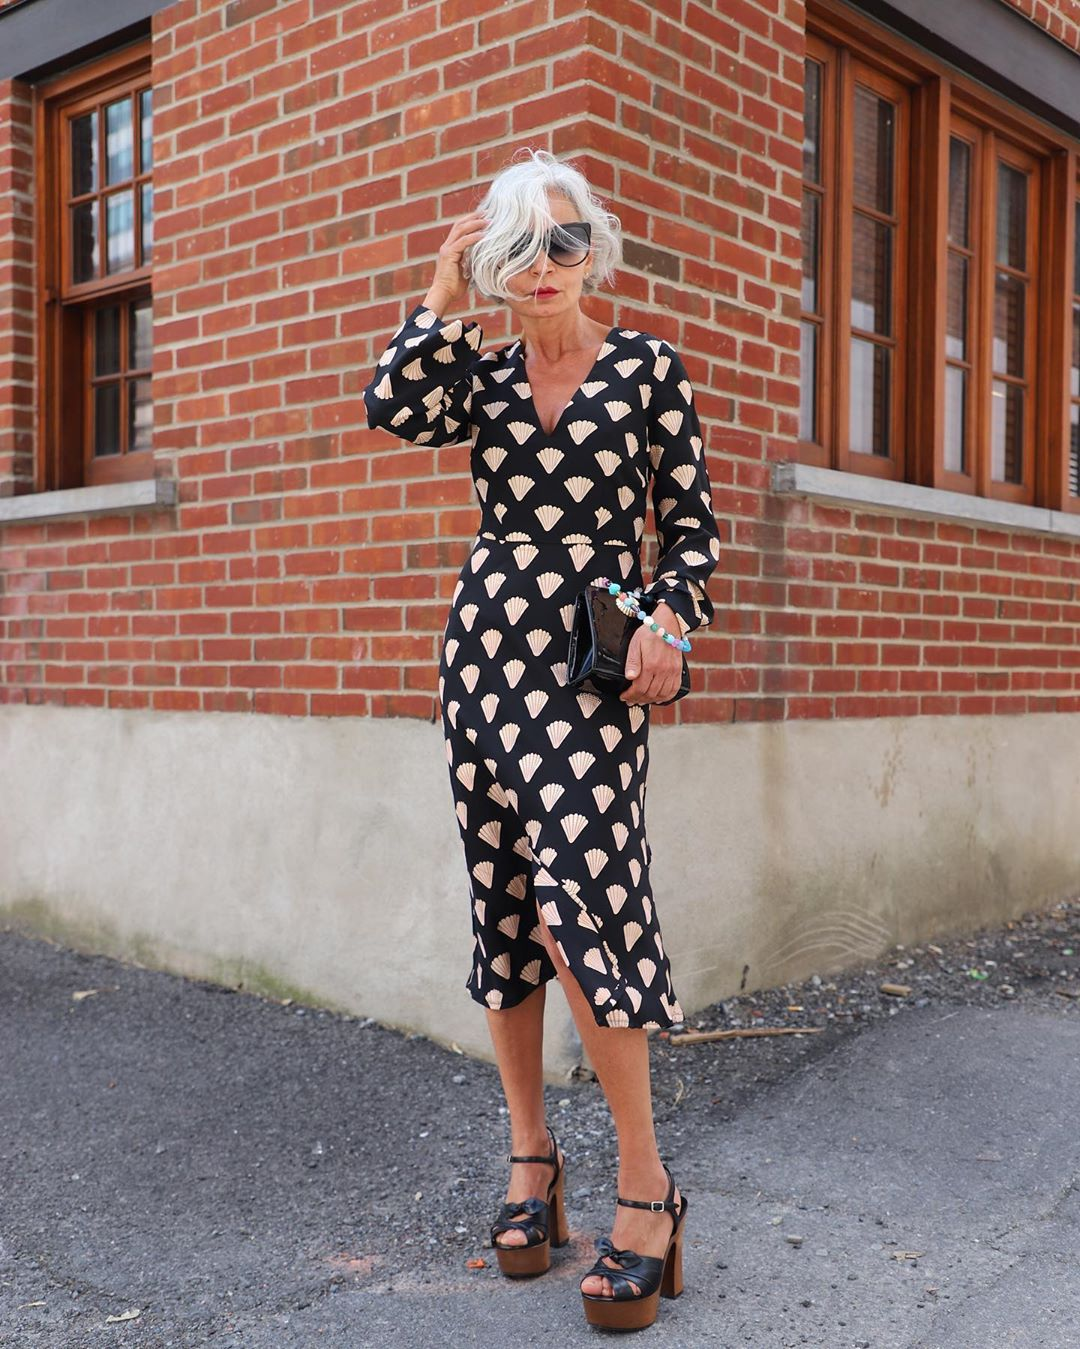 Mature classy woman in polka dot dress and gray hair.